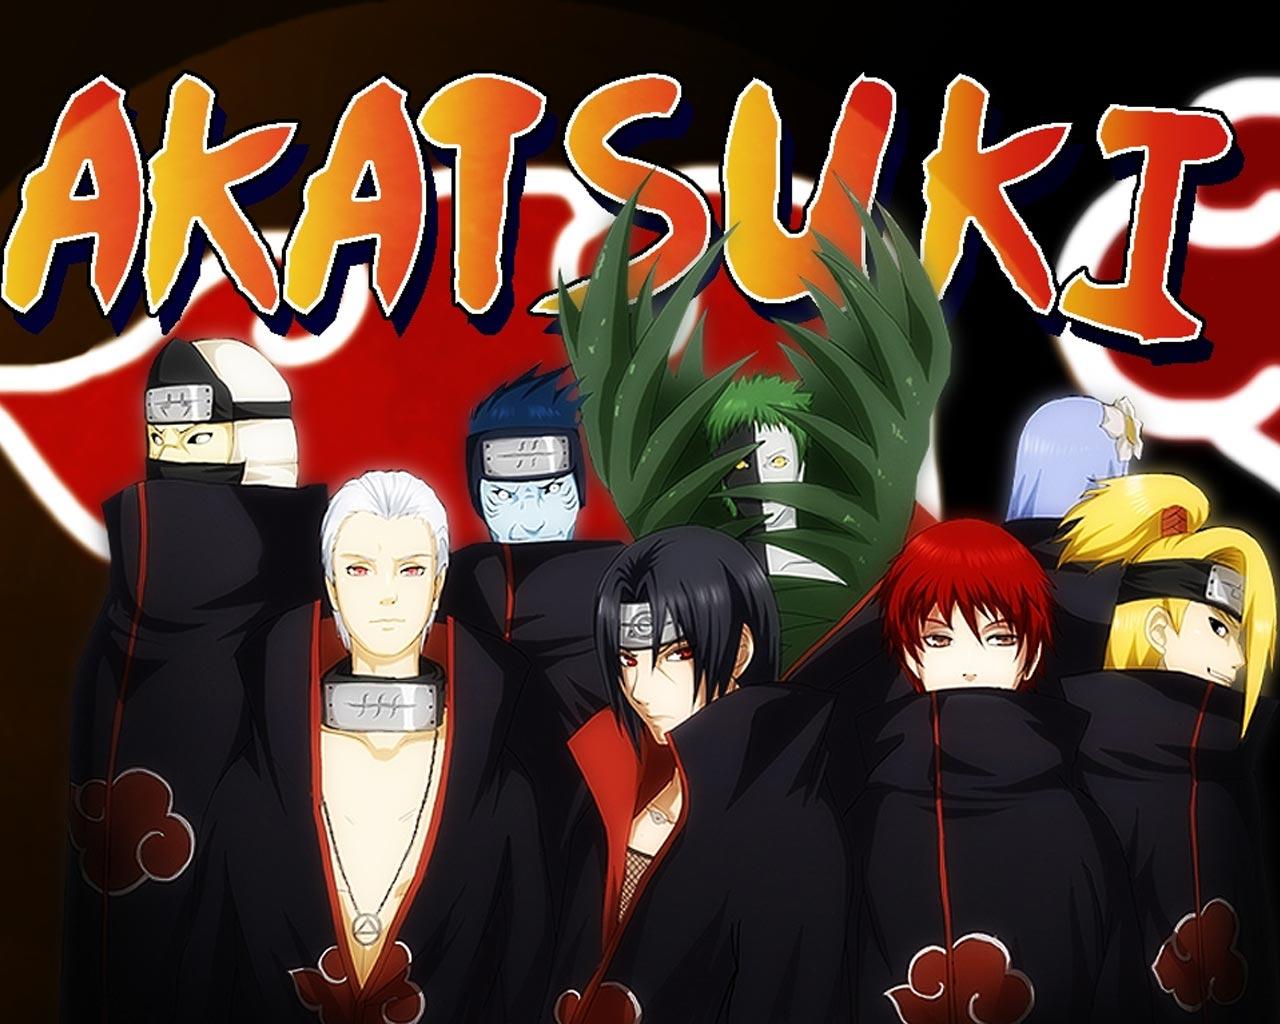 http://3.bp.blogspot.com/-TEIkCfRer_s/TtivGuyQ44I/AAAAAAAAB6s/OUDTQH9iYrE/s1600/akatsuki-members.jpg